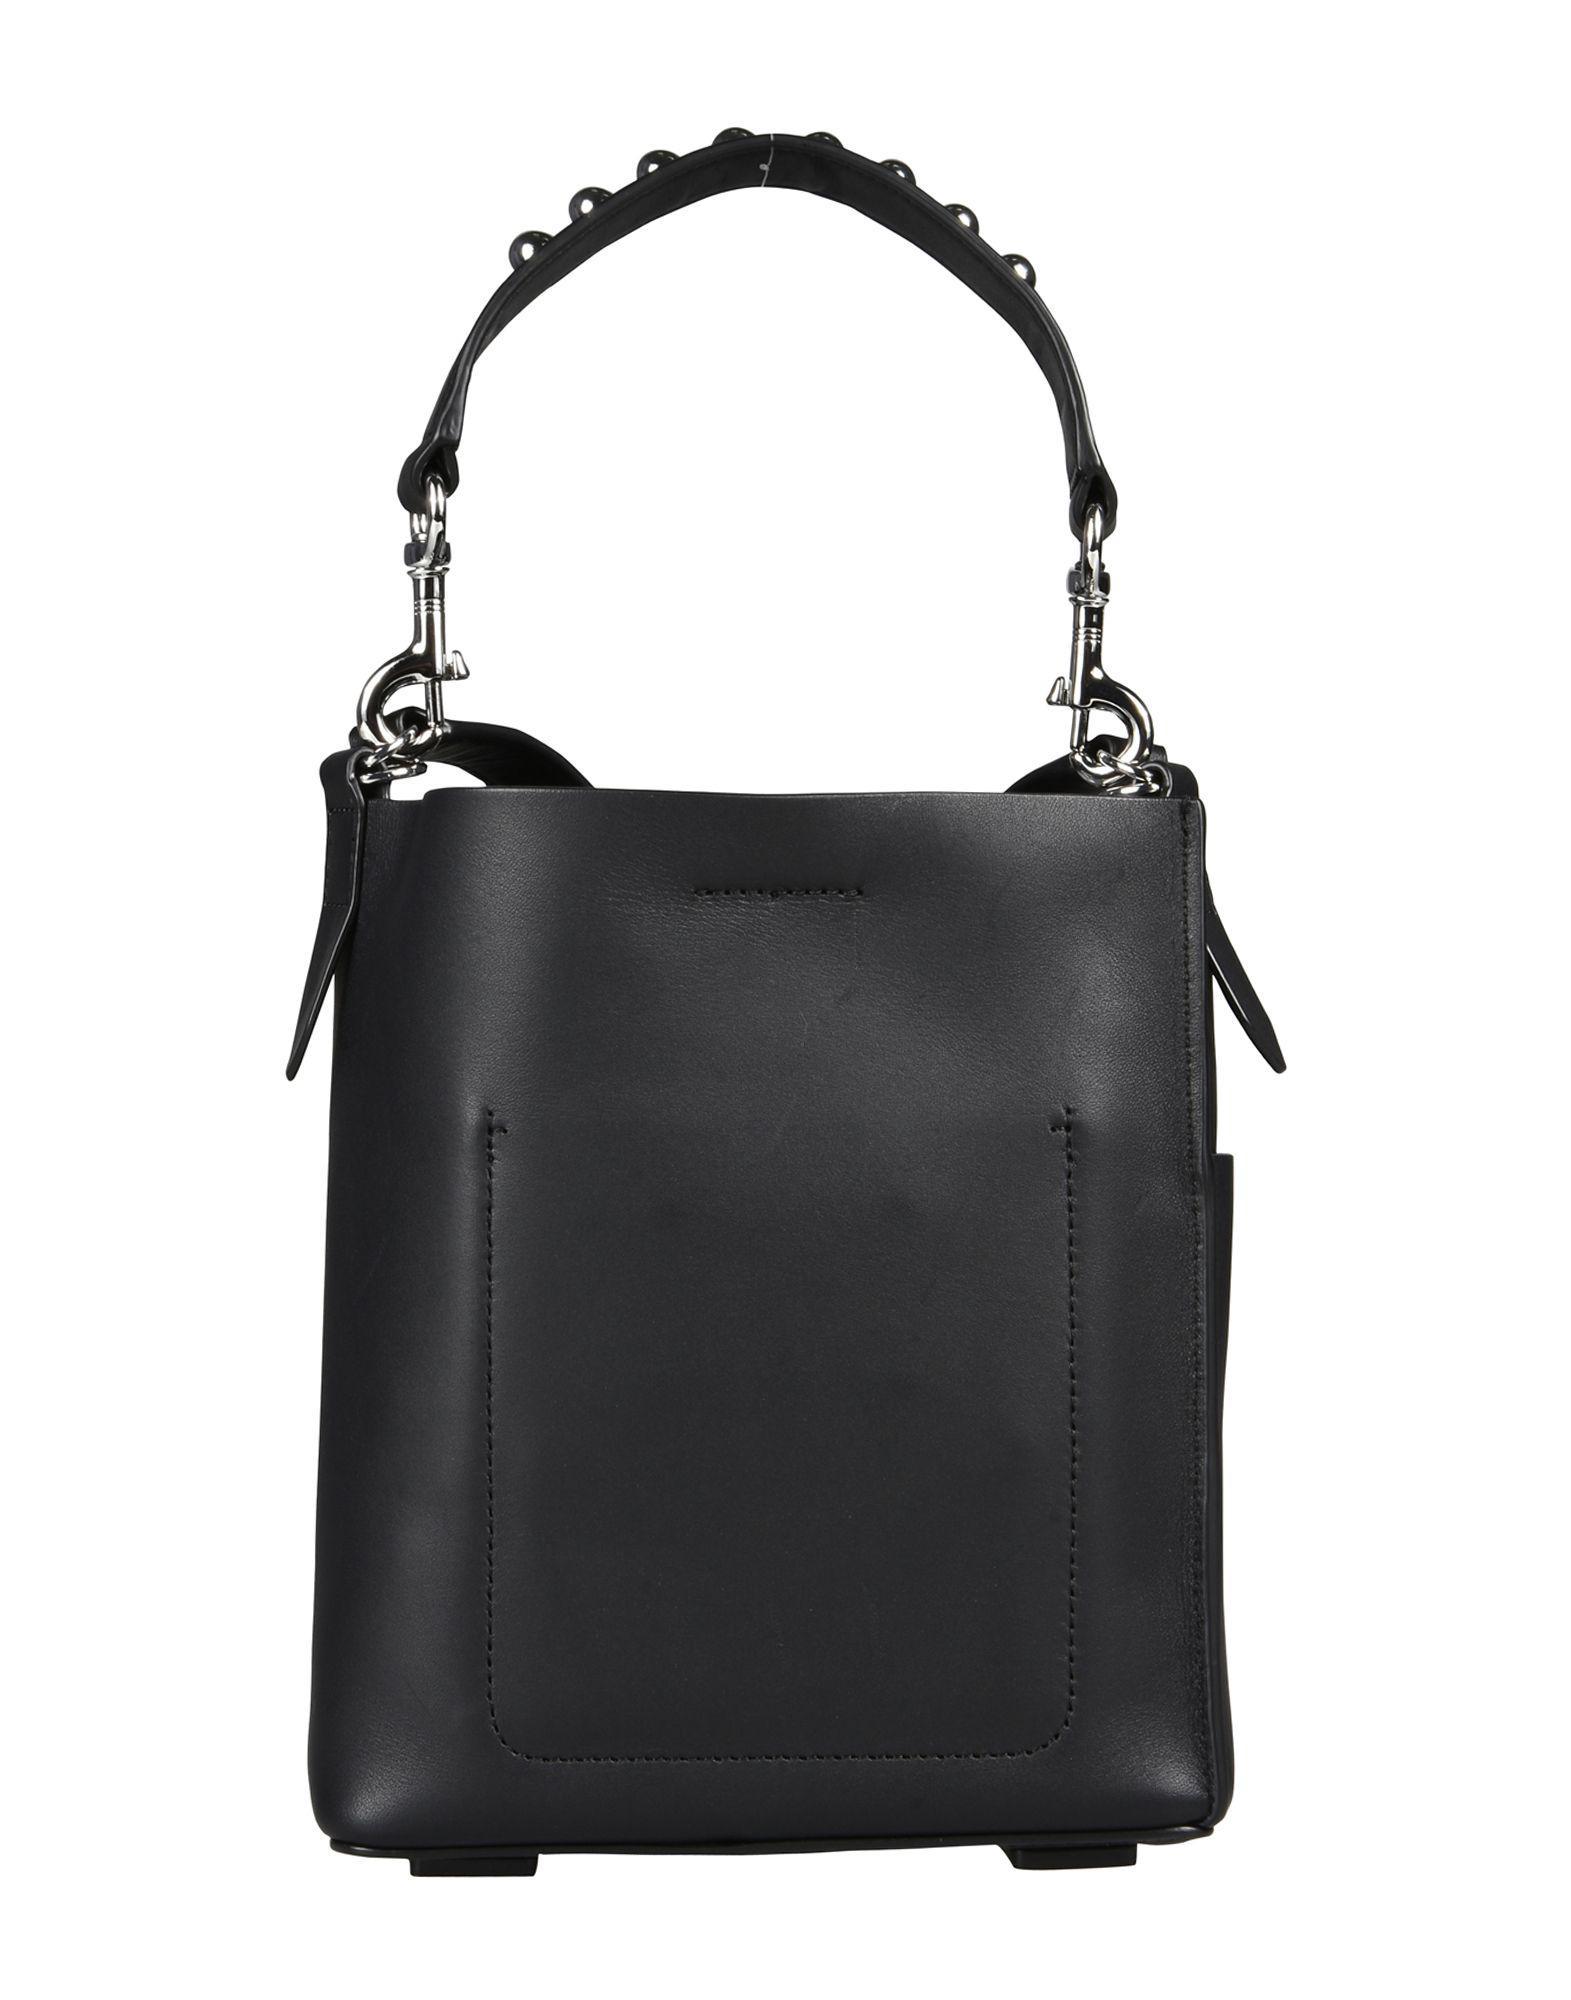 AllSaints Cross-body Bag in Black